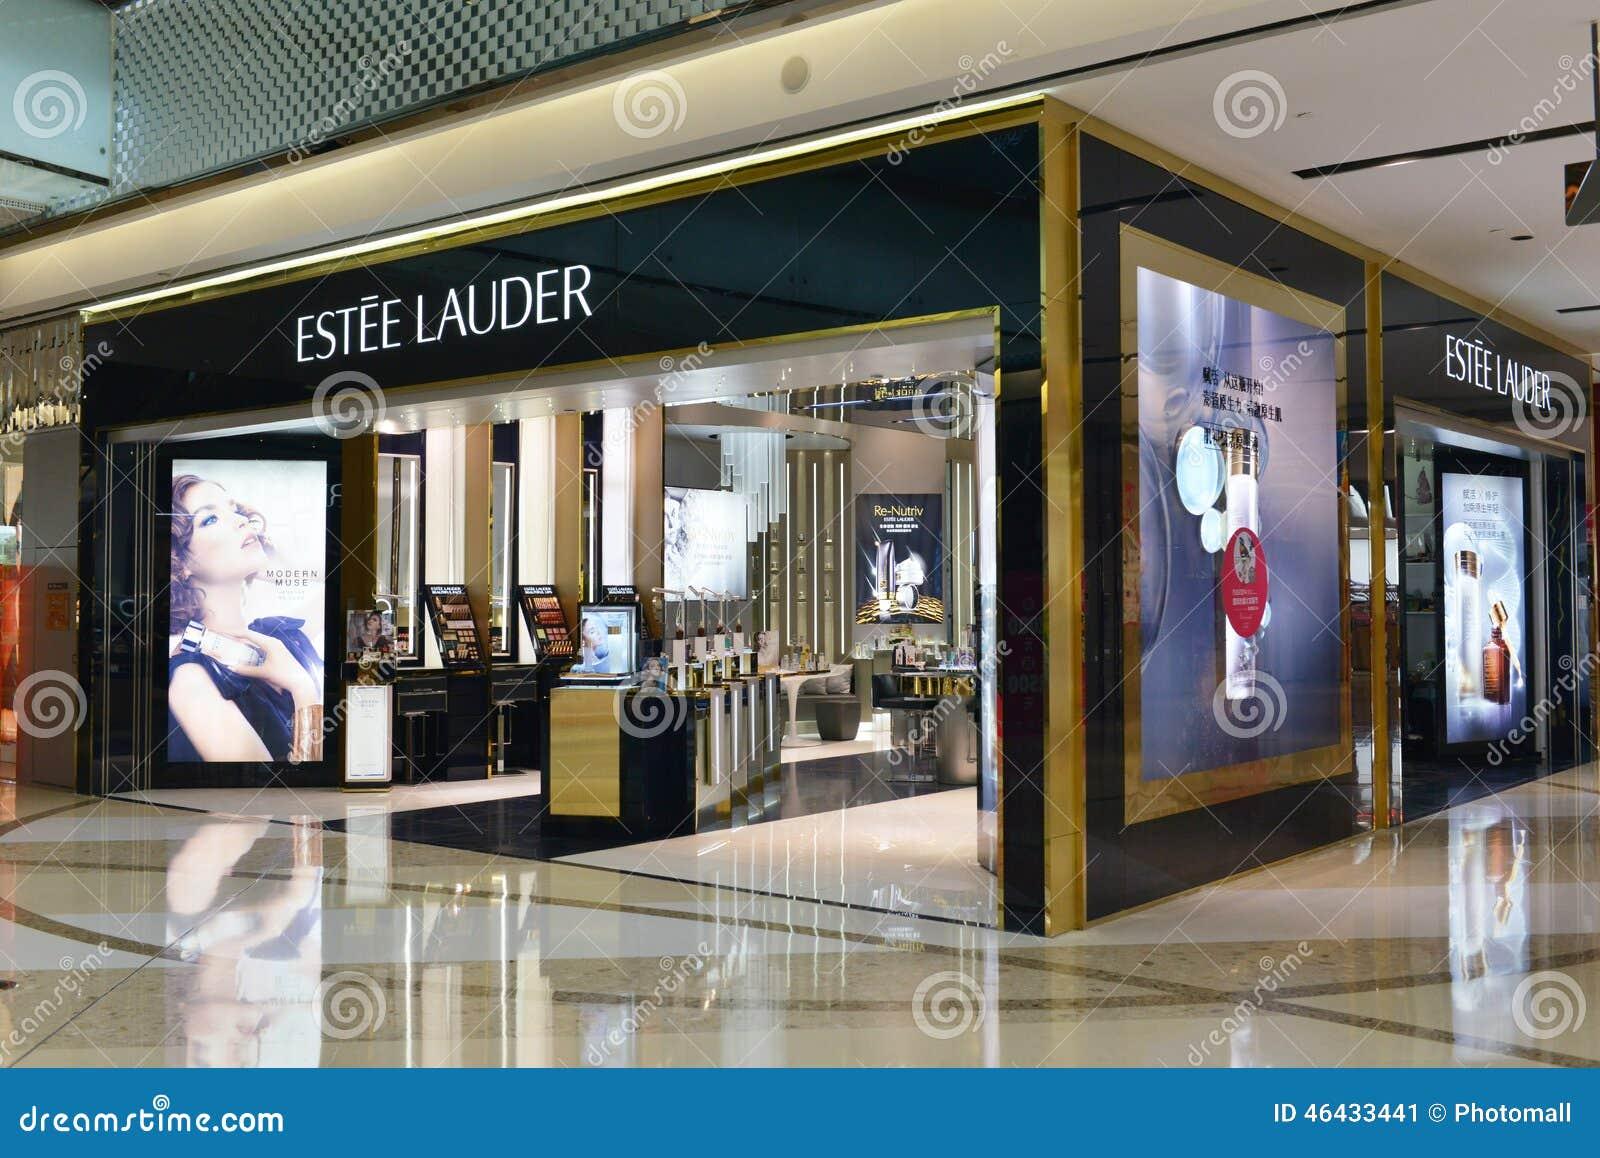 Online estee lauder shopping